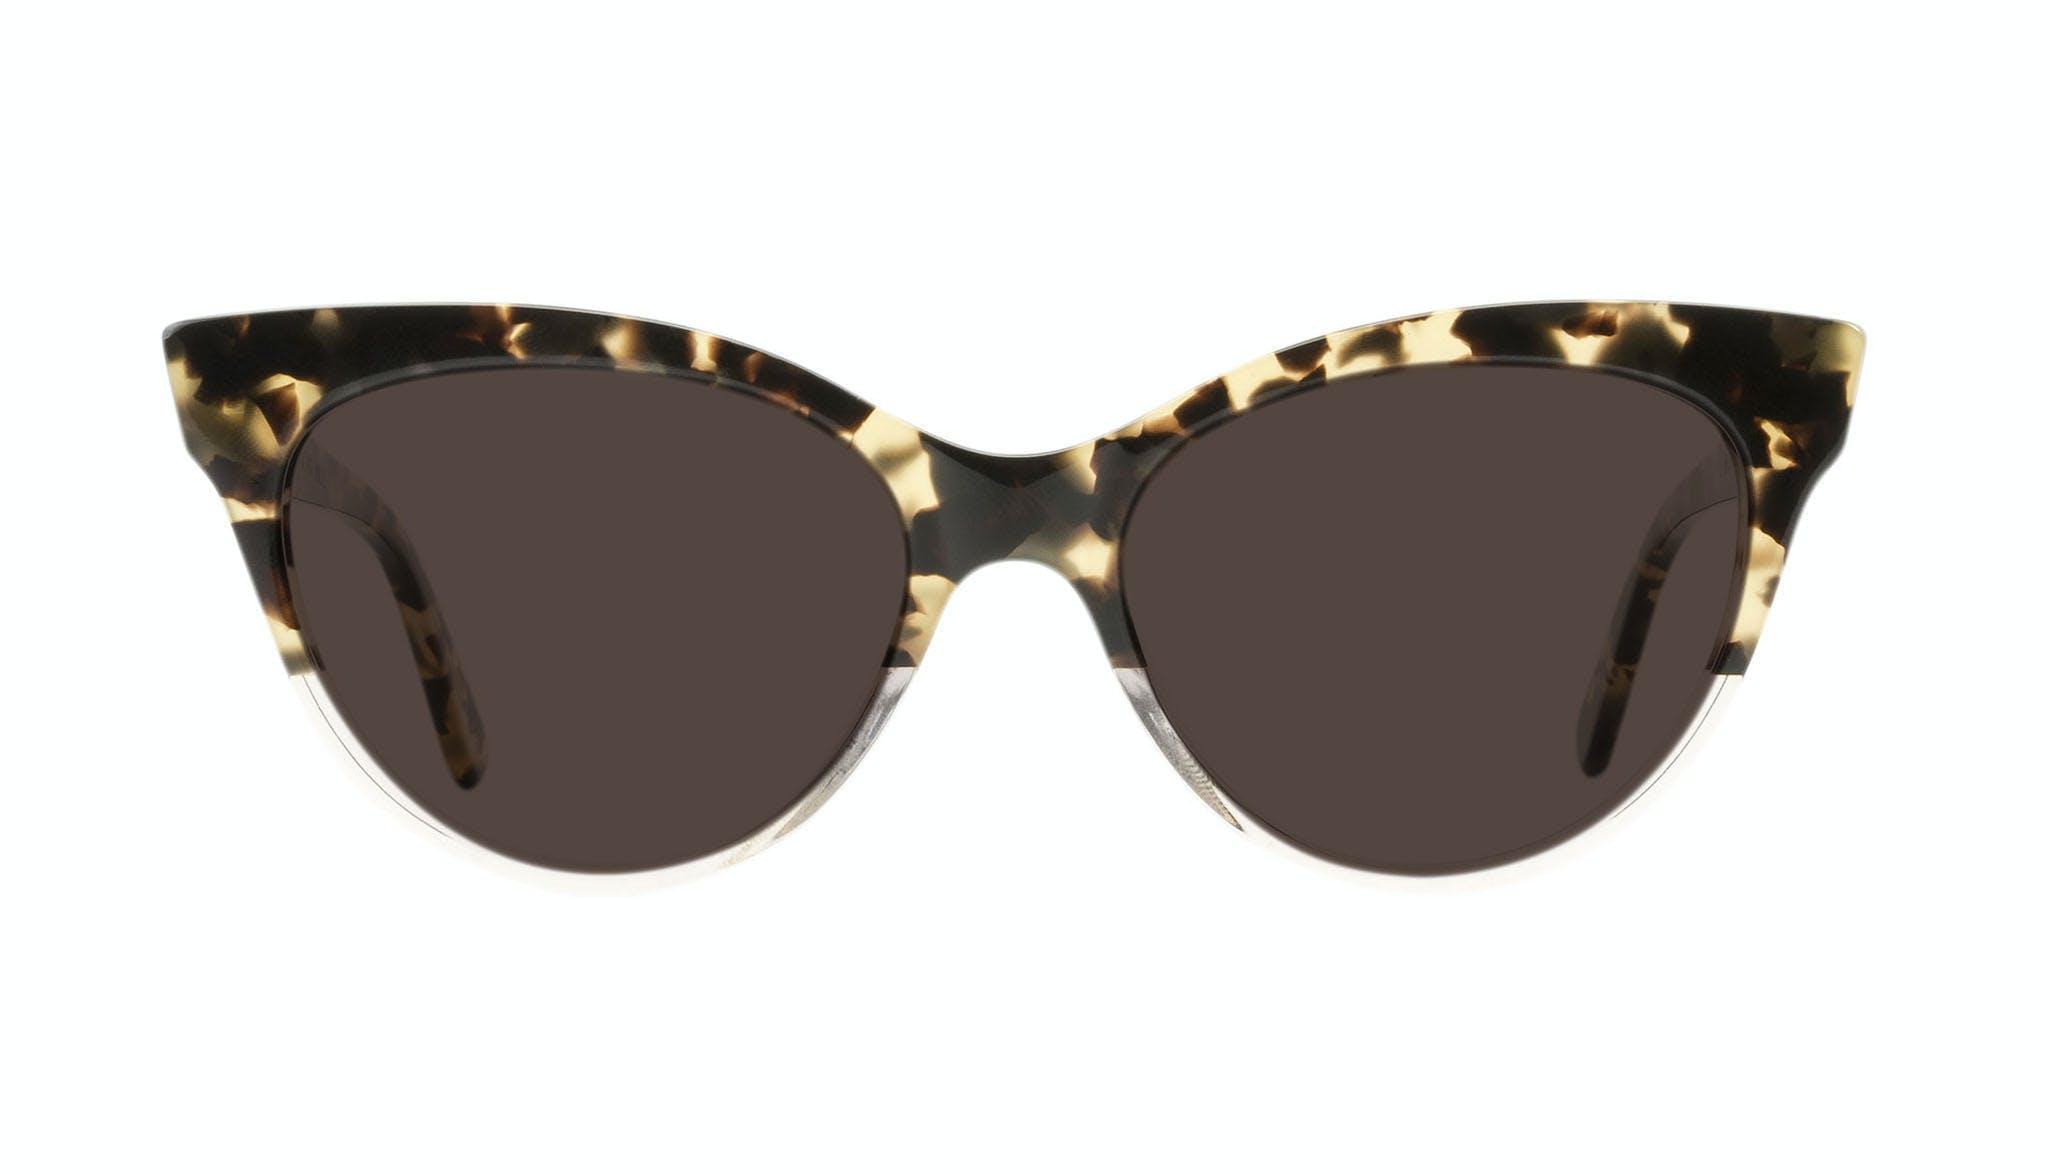 Affordable Fashion Glasses Cat Eye Daring Cateye Sunglasses Women SkunkBoy Champagne Tort Front